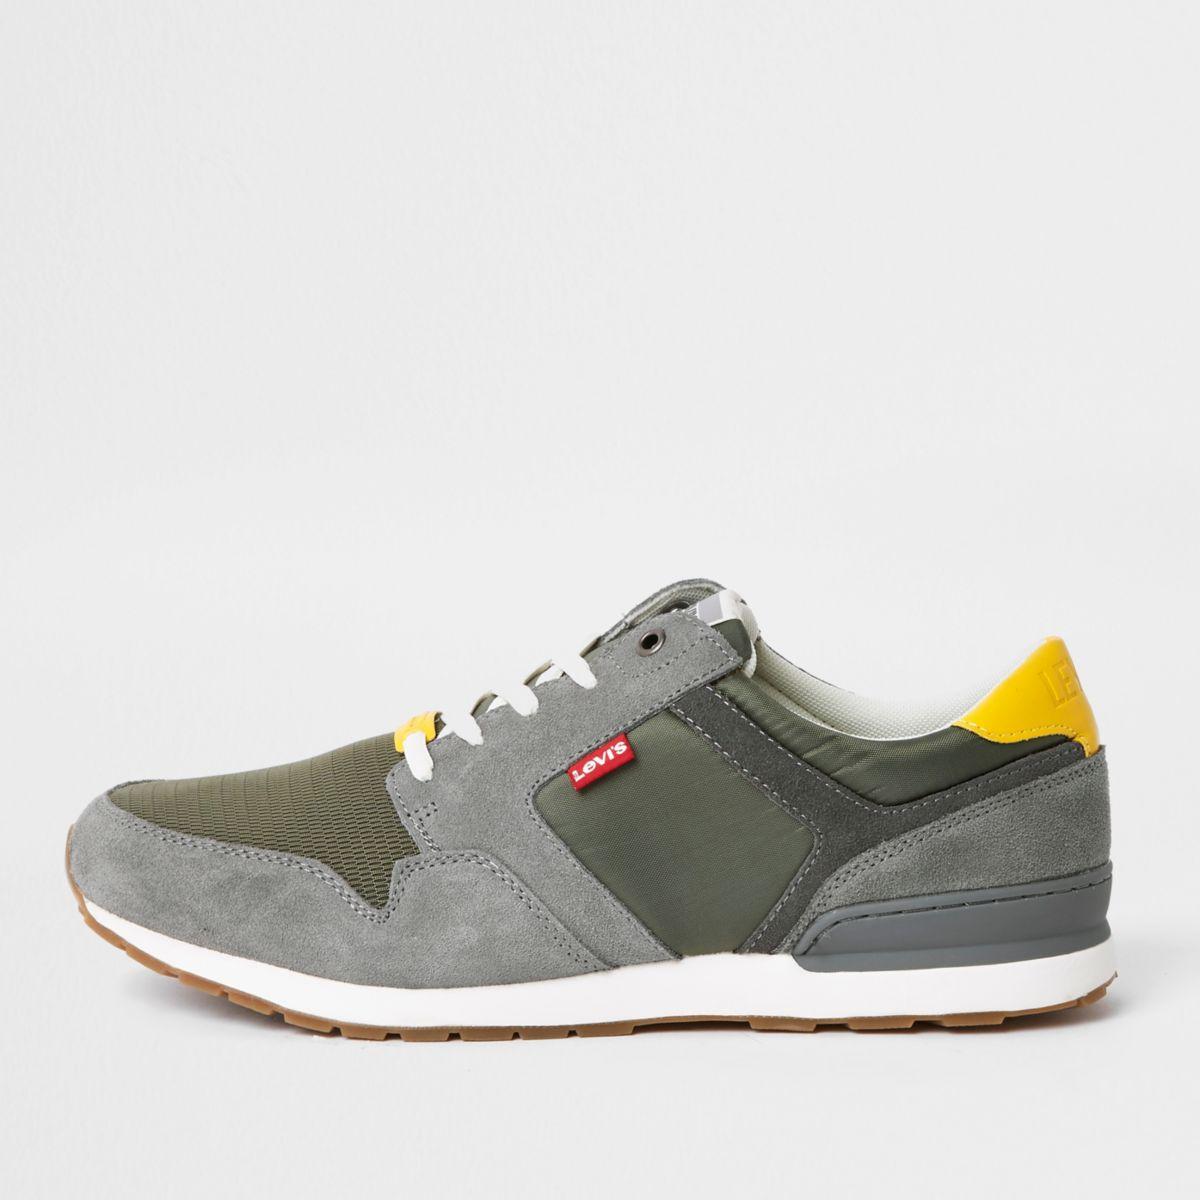 Levi's green runner sneakers